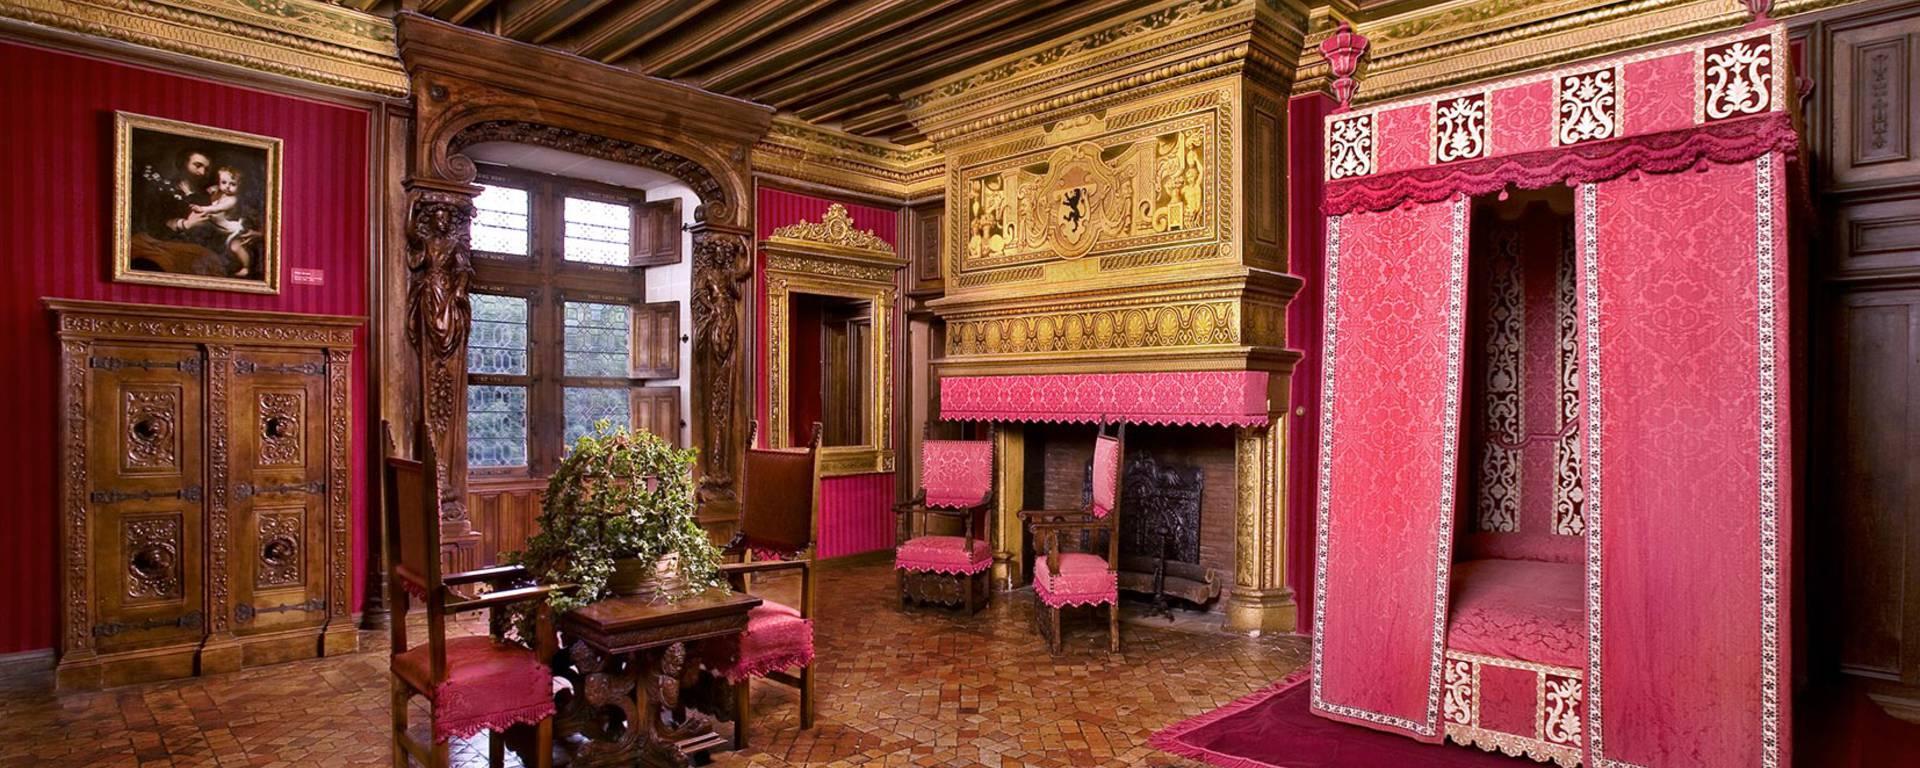 Interior of the Château de Chenonceau